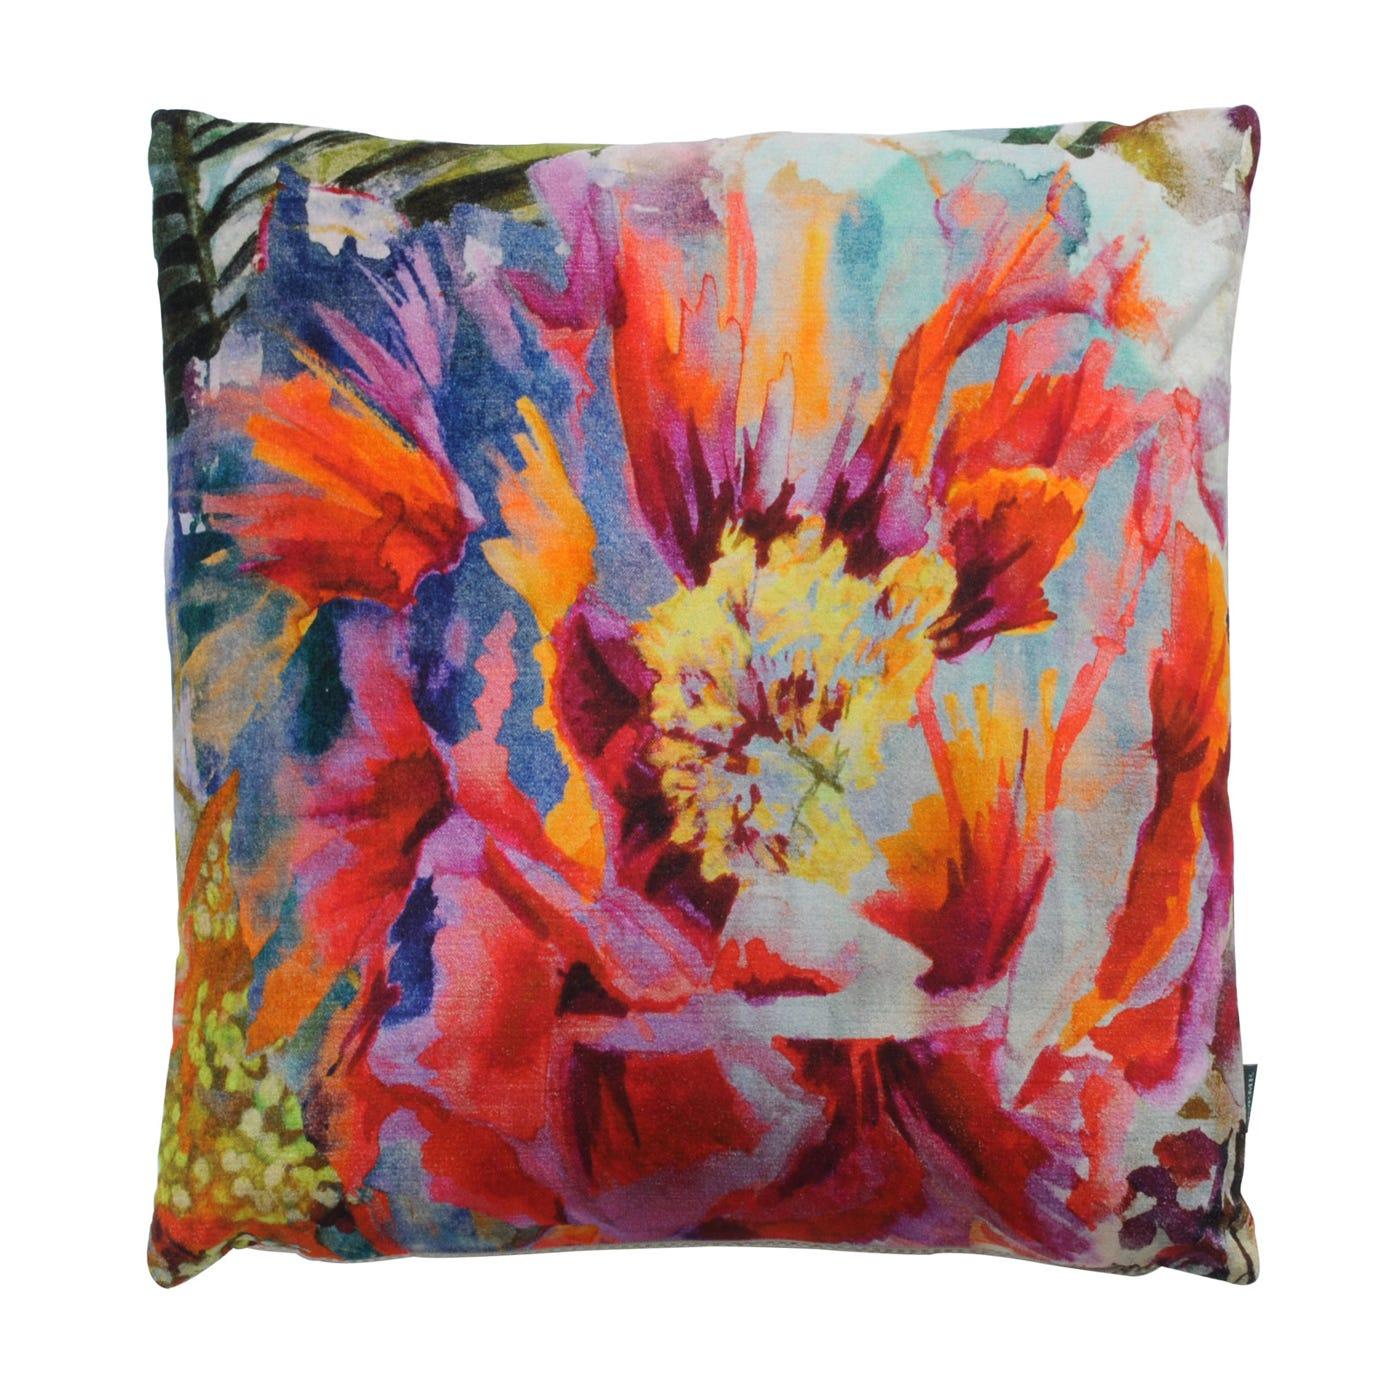 Boeme Peony Velvet Cushion